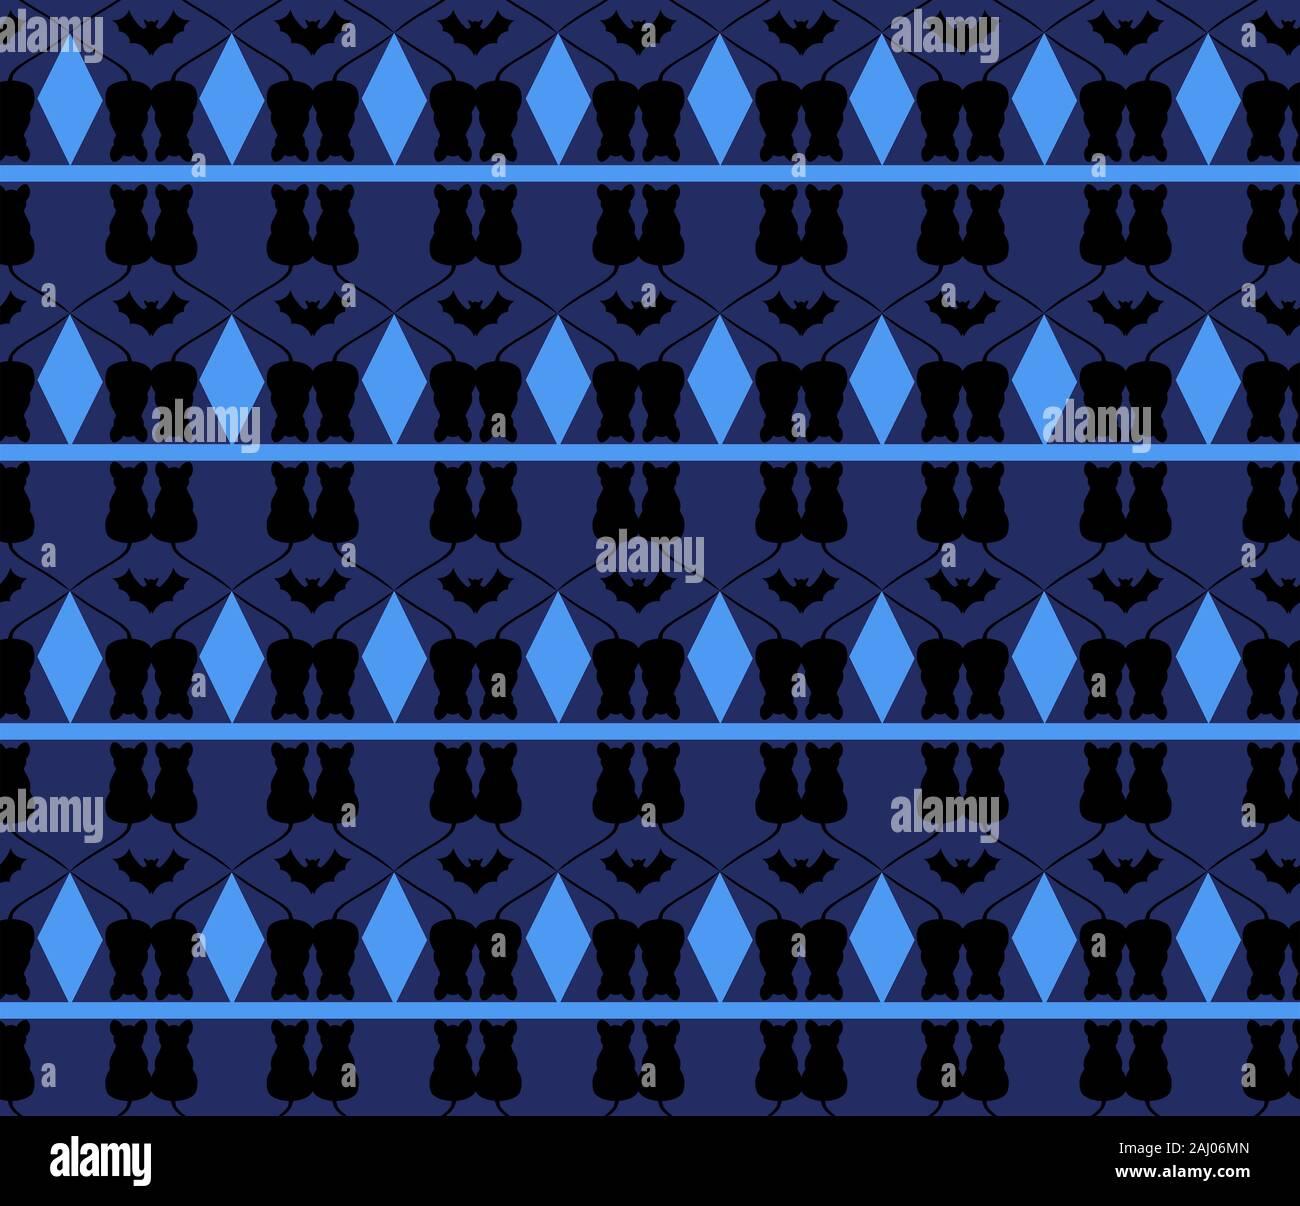 Azul oscuro patrón sin fisuras con ratones y murciélagos. Rombos de color azul brillante sobre un fondo azul oscuro. Foto de stock